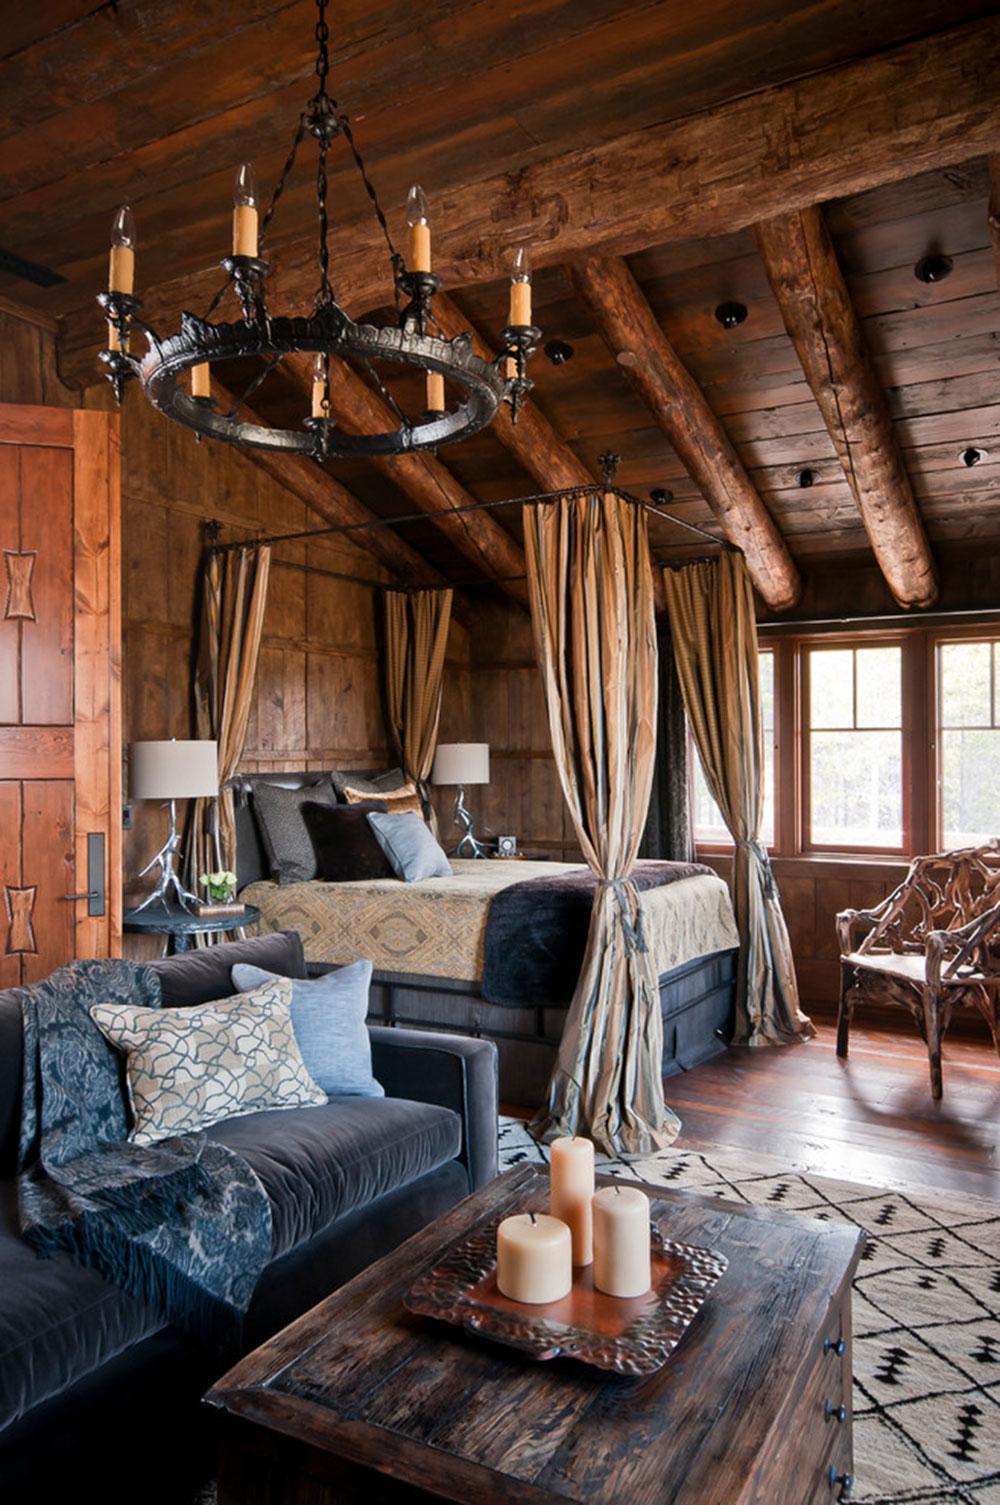 Rustik-sovrum-design-idéer-som-utstrålar-komfort-13 Rustik-sovrum-design-idéer-som-utstrålar komfort